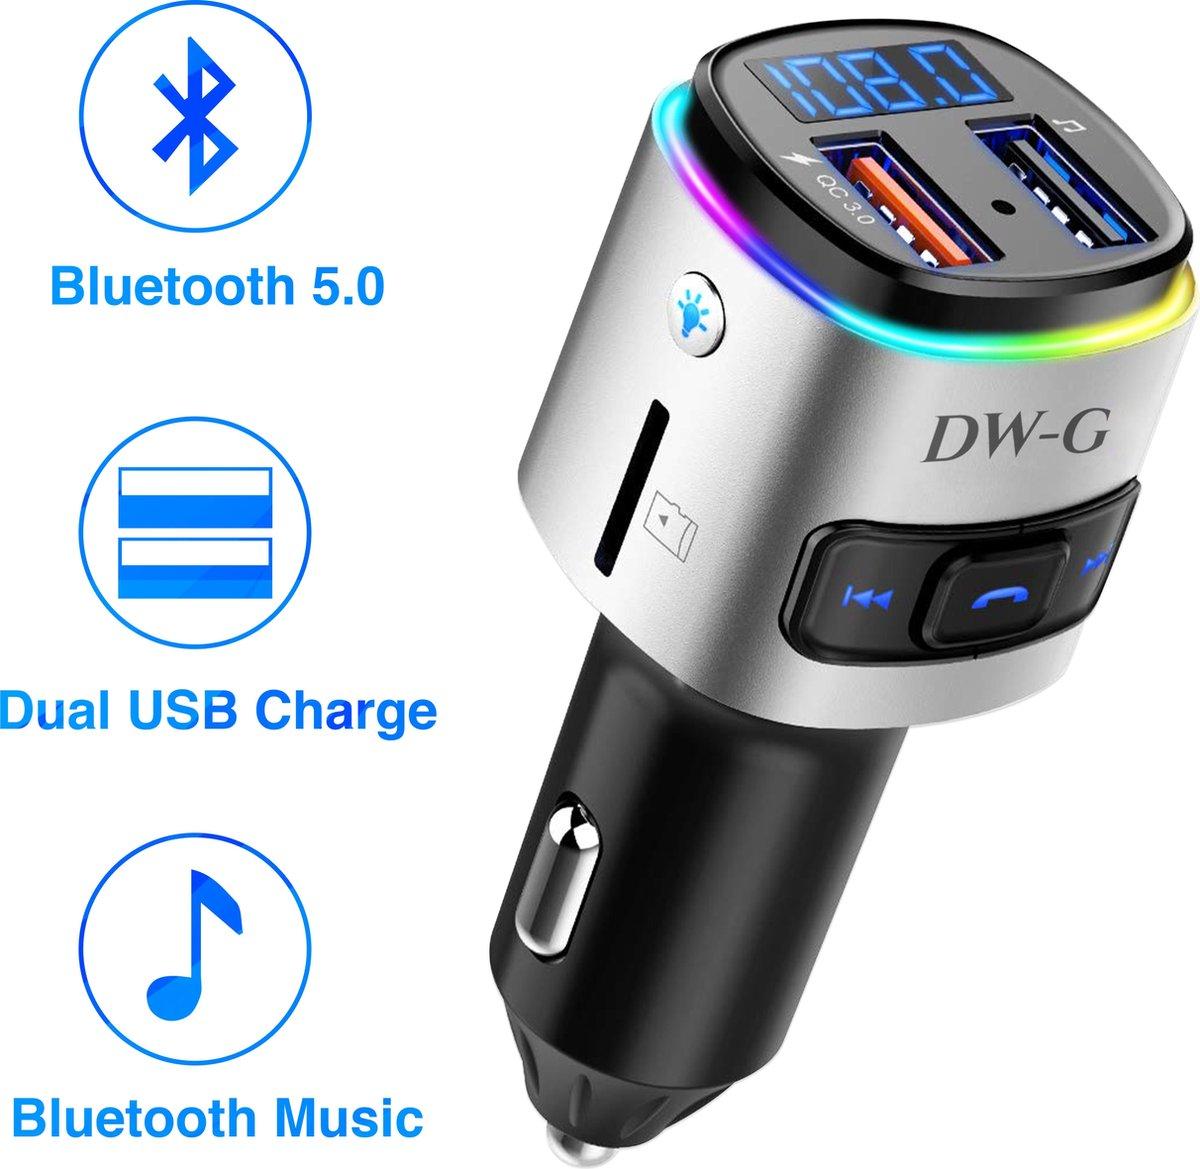 DW-G Bluetooth FM Transmitter - Auto Lader - Carkit - Handsfree - MP3 - USB - SD Kaart - Snel Lader